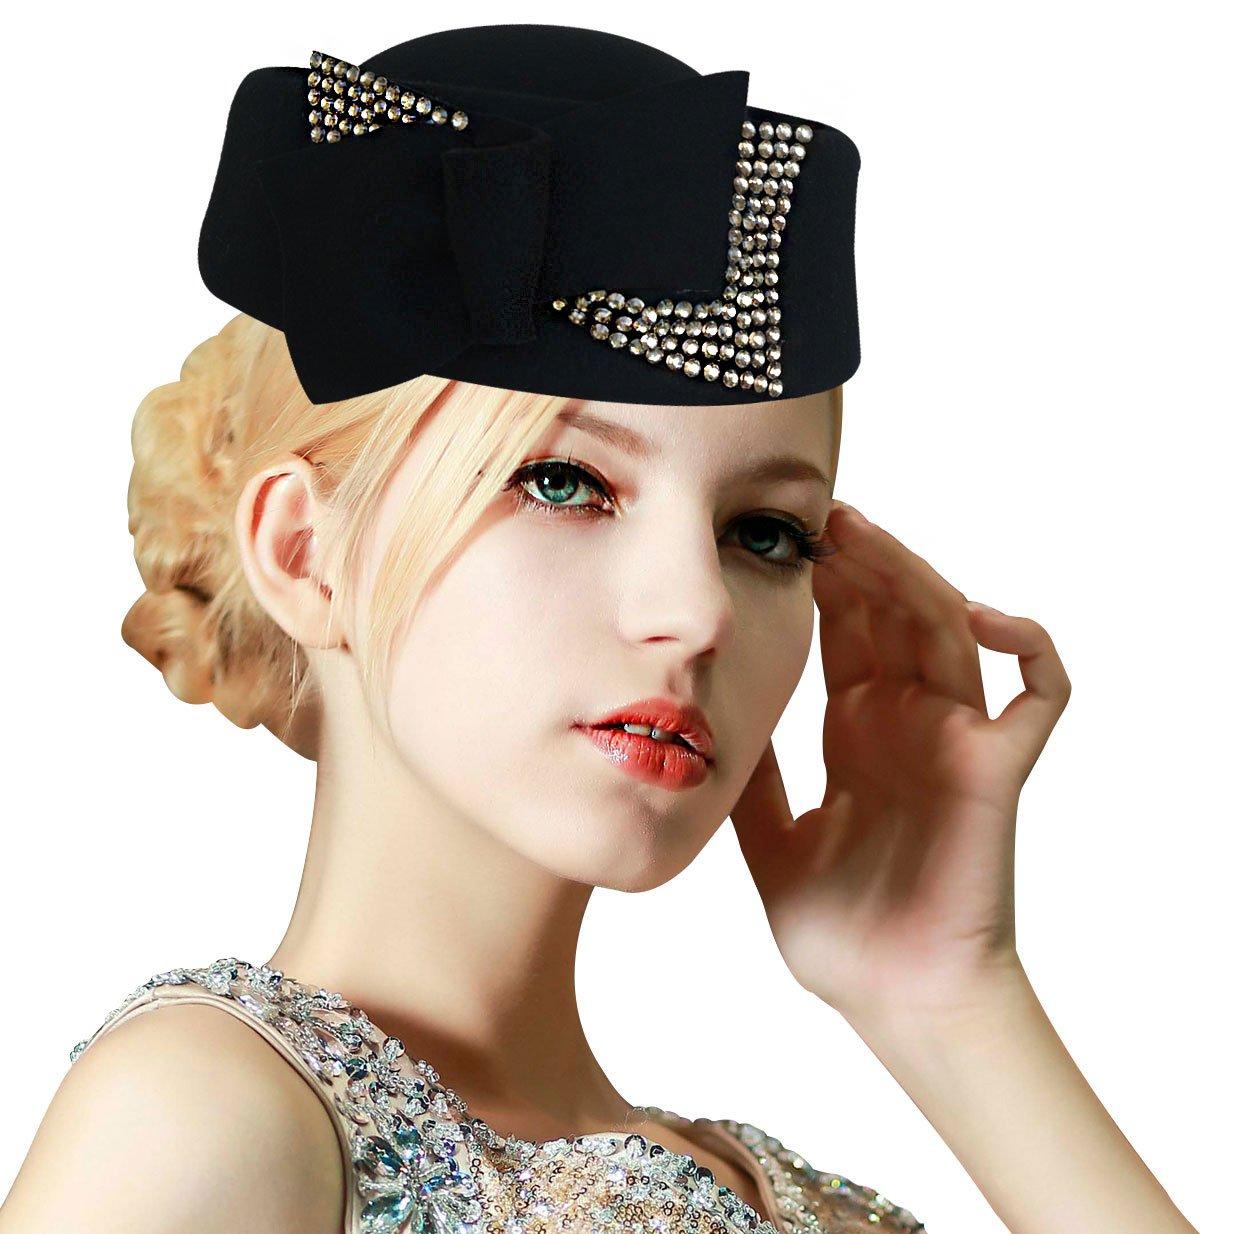 Ladies Rhinestone Teardrop Fancy Wool Fascinator Cocktail Pillbox Cap Hat A254 (Black) by Lawliet